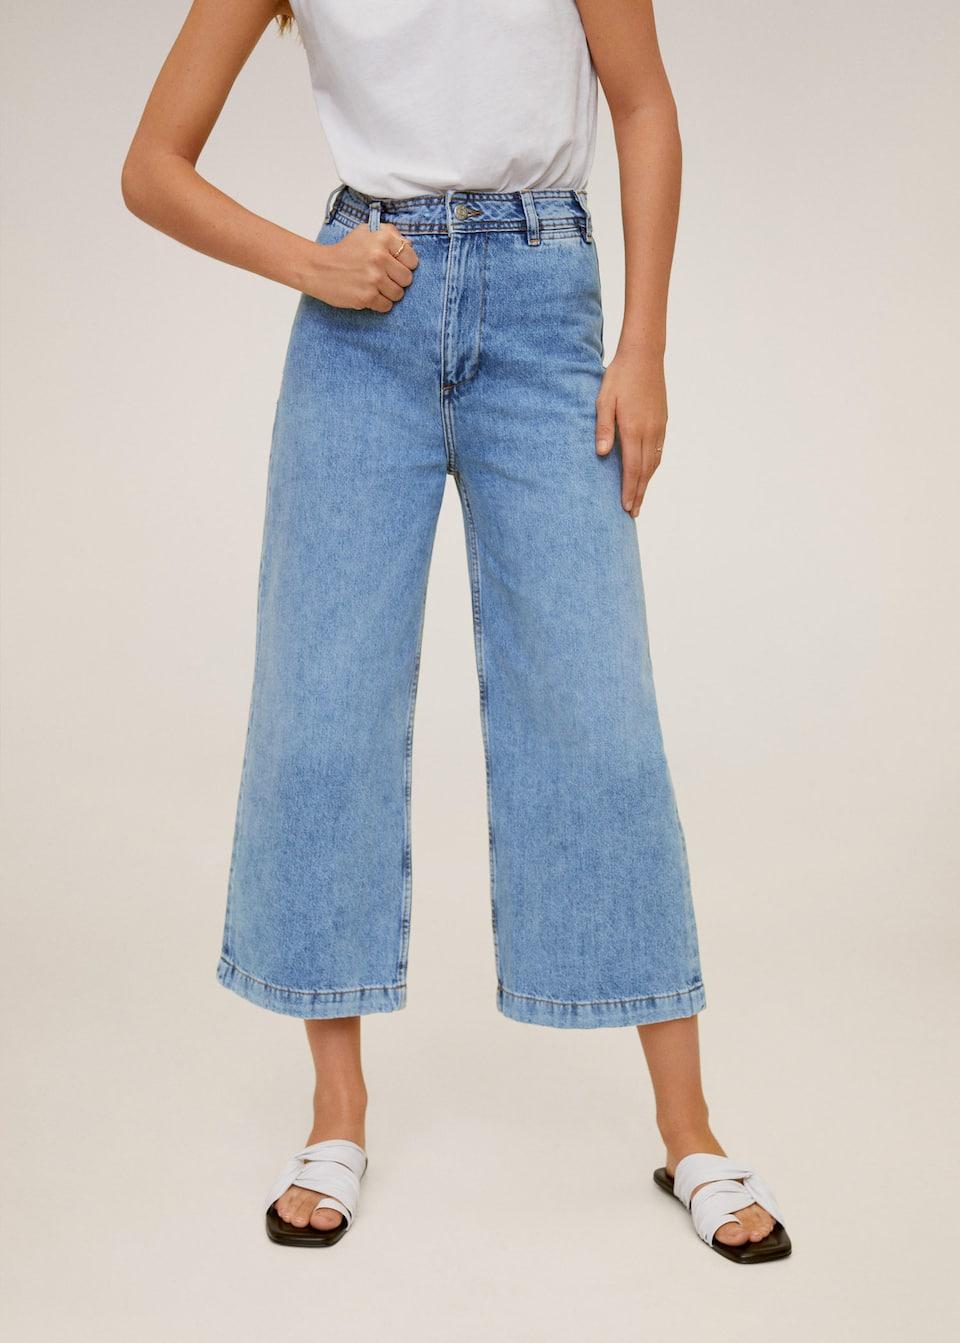 High-waist culotte jeans - Woman   Mango Indonesia